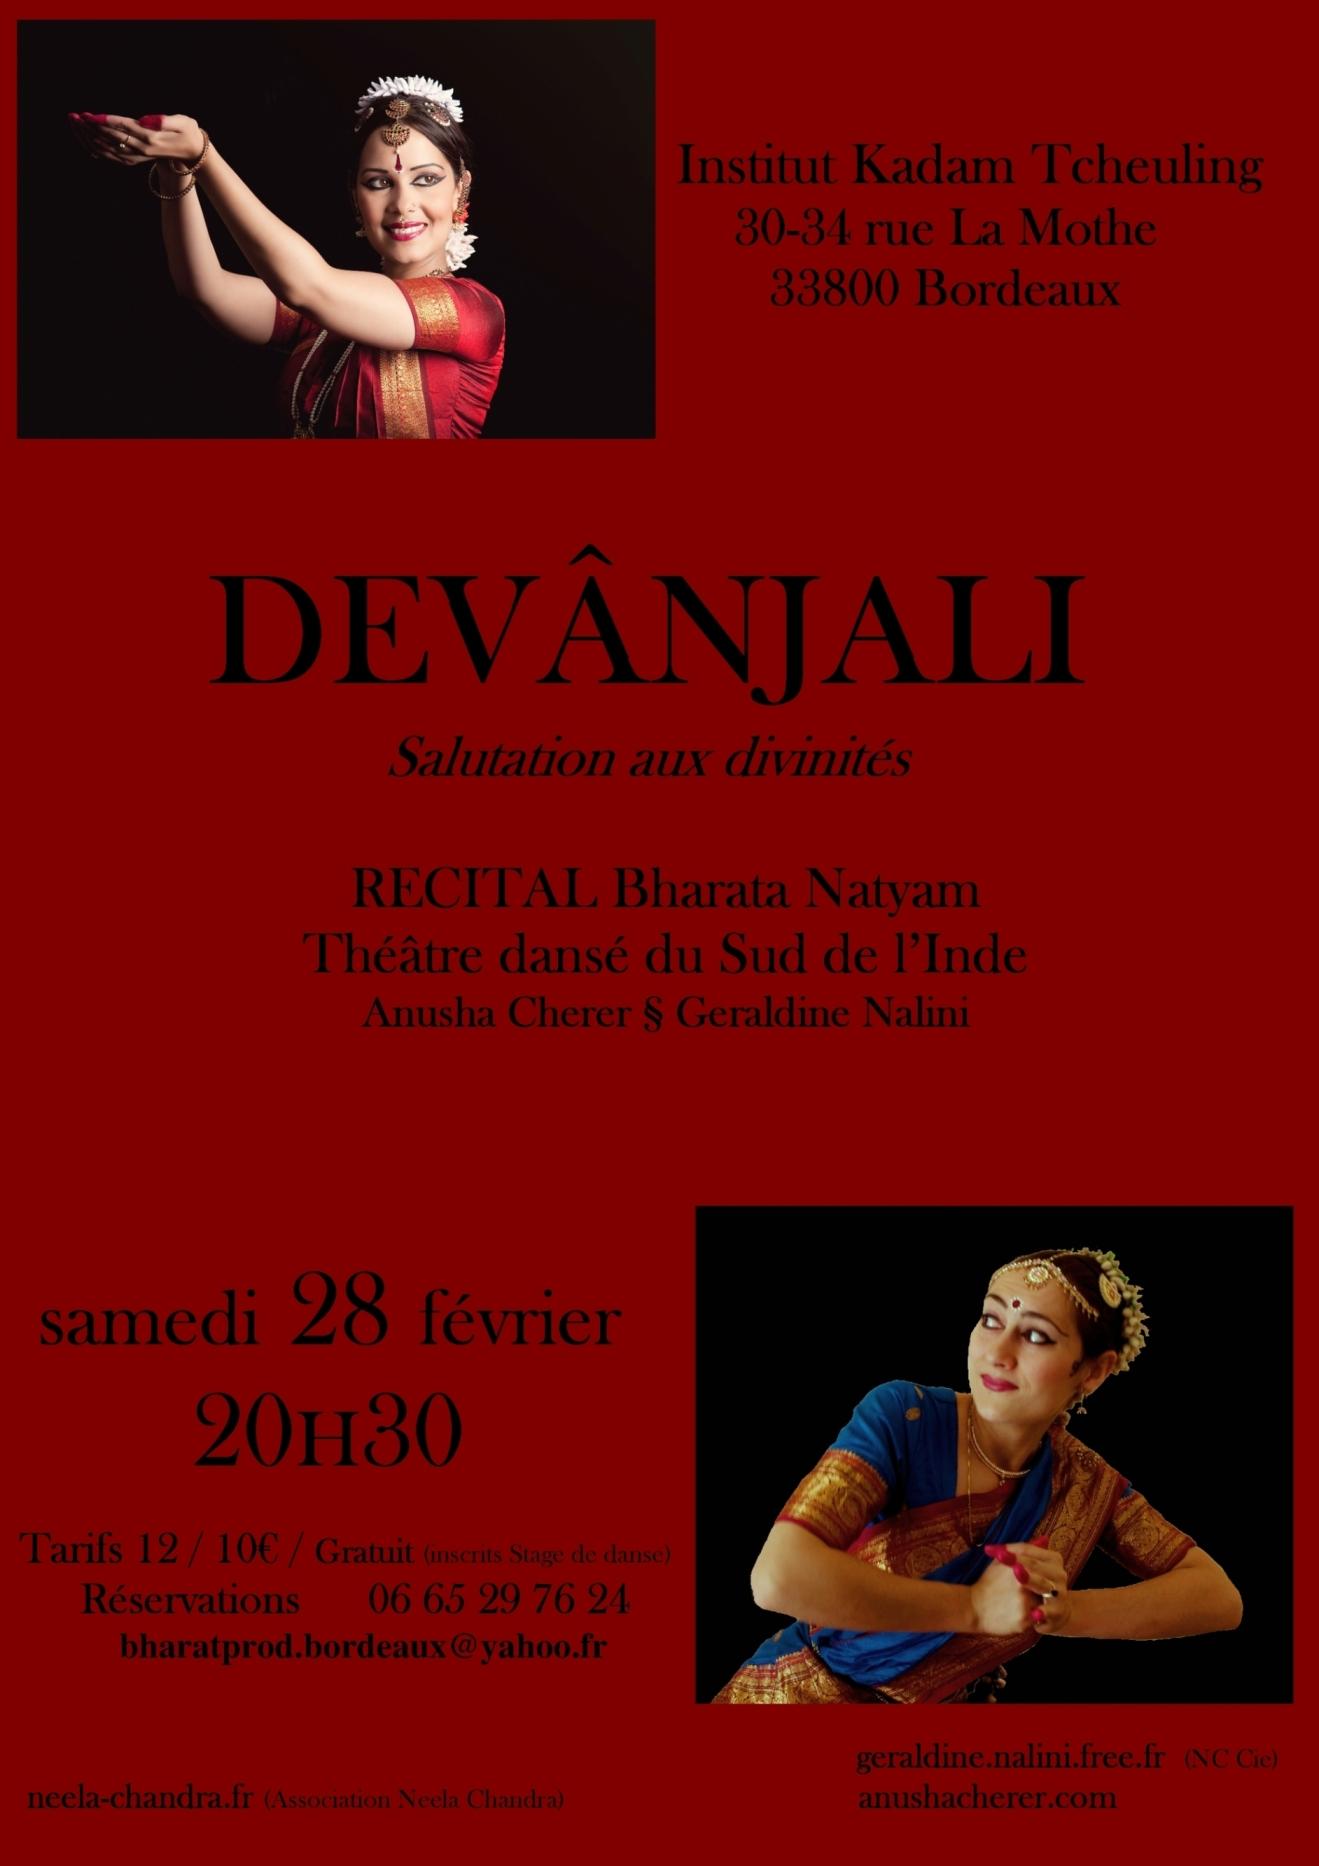 Bharata Natyam - Devanjali